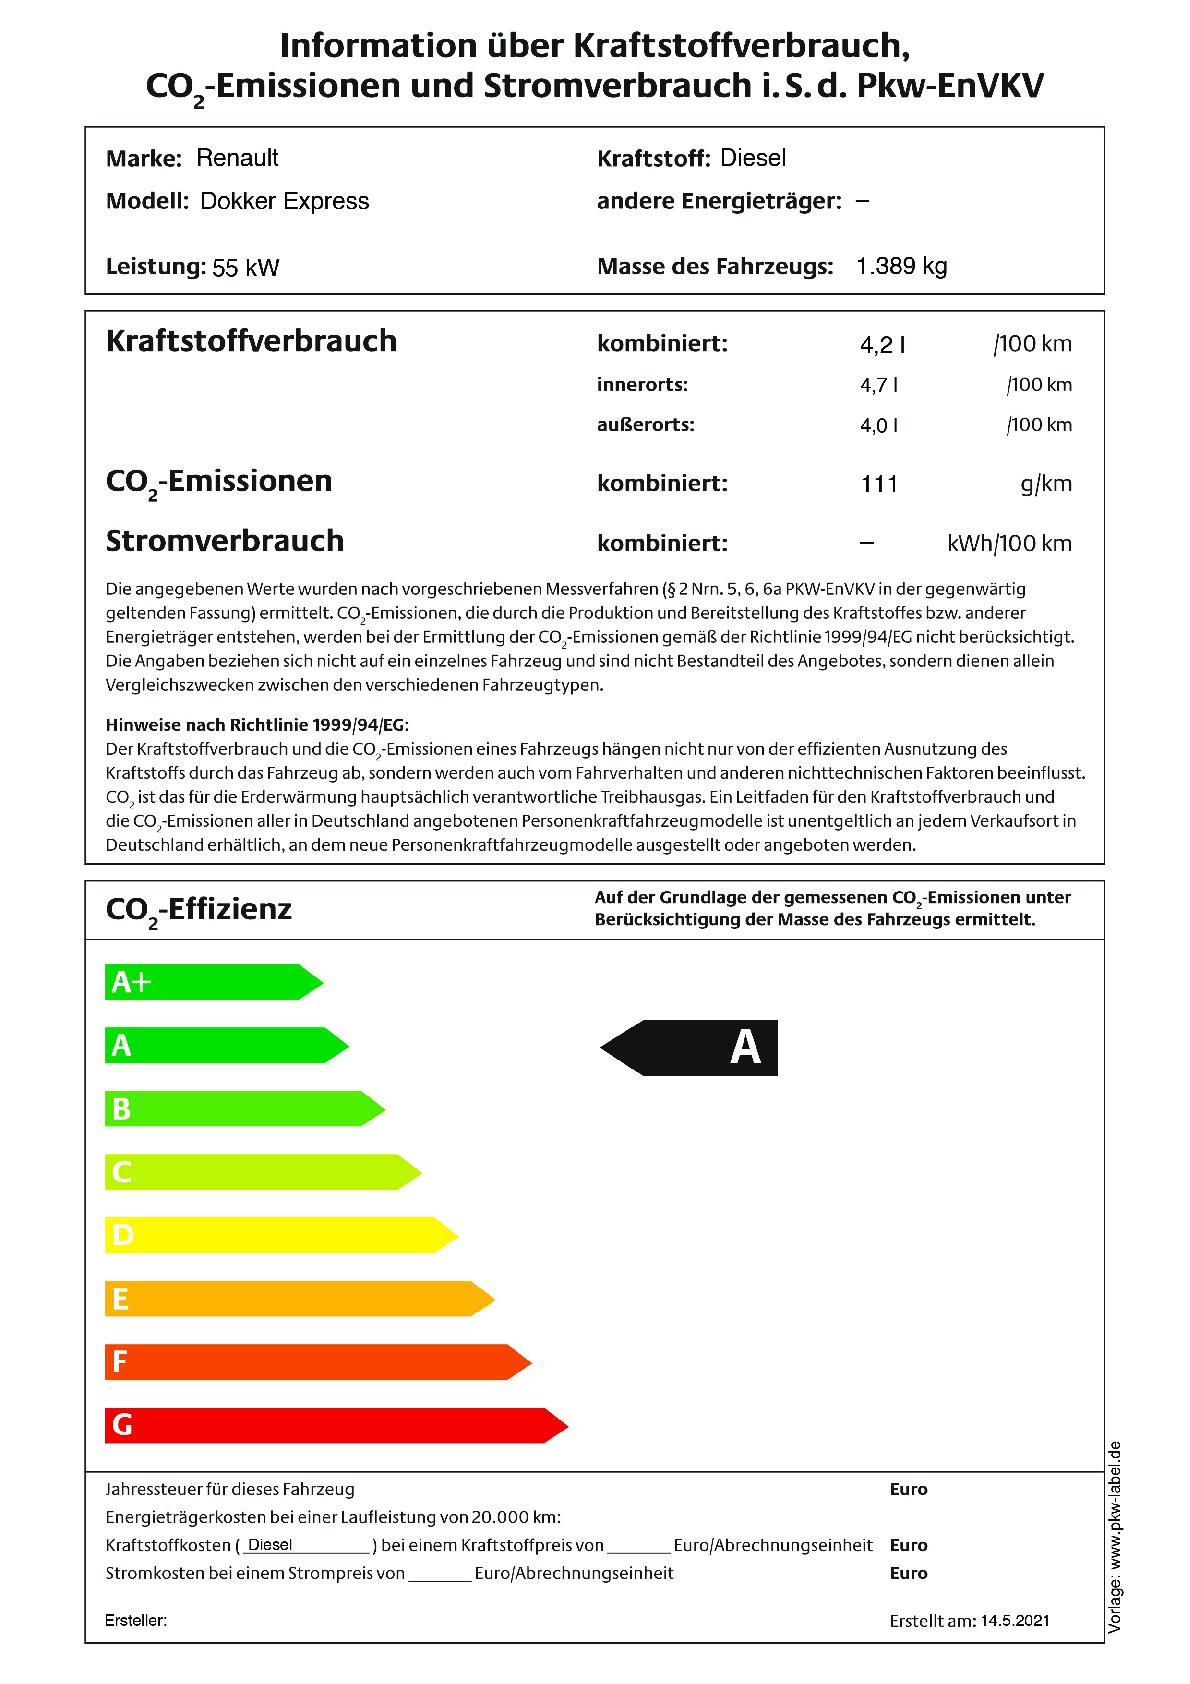 Energielabel 1.5 Blue dCi 75